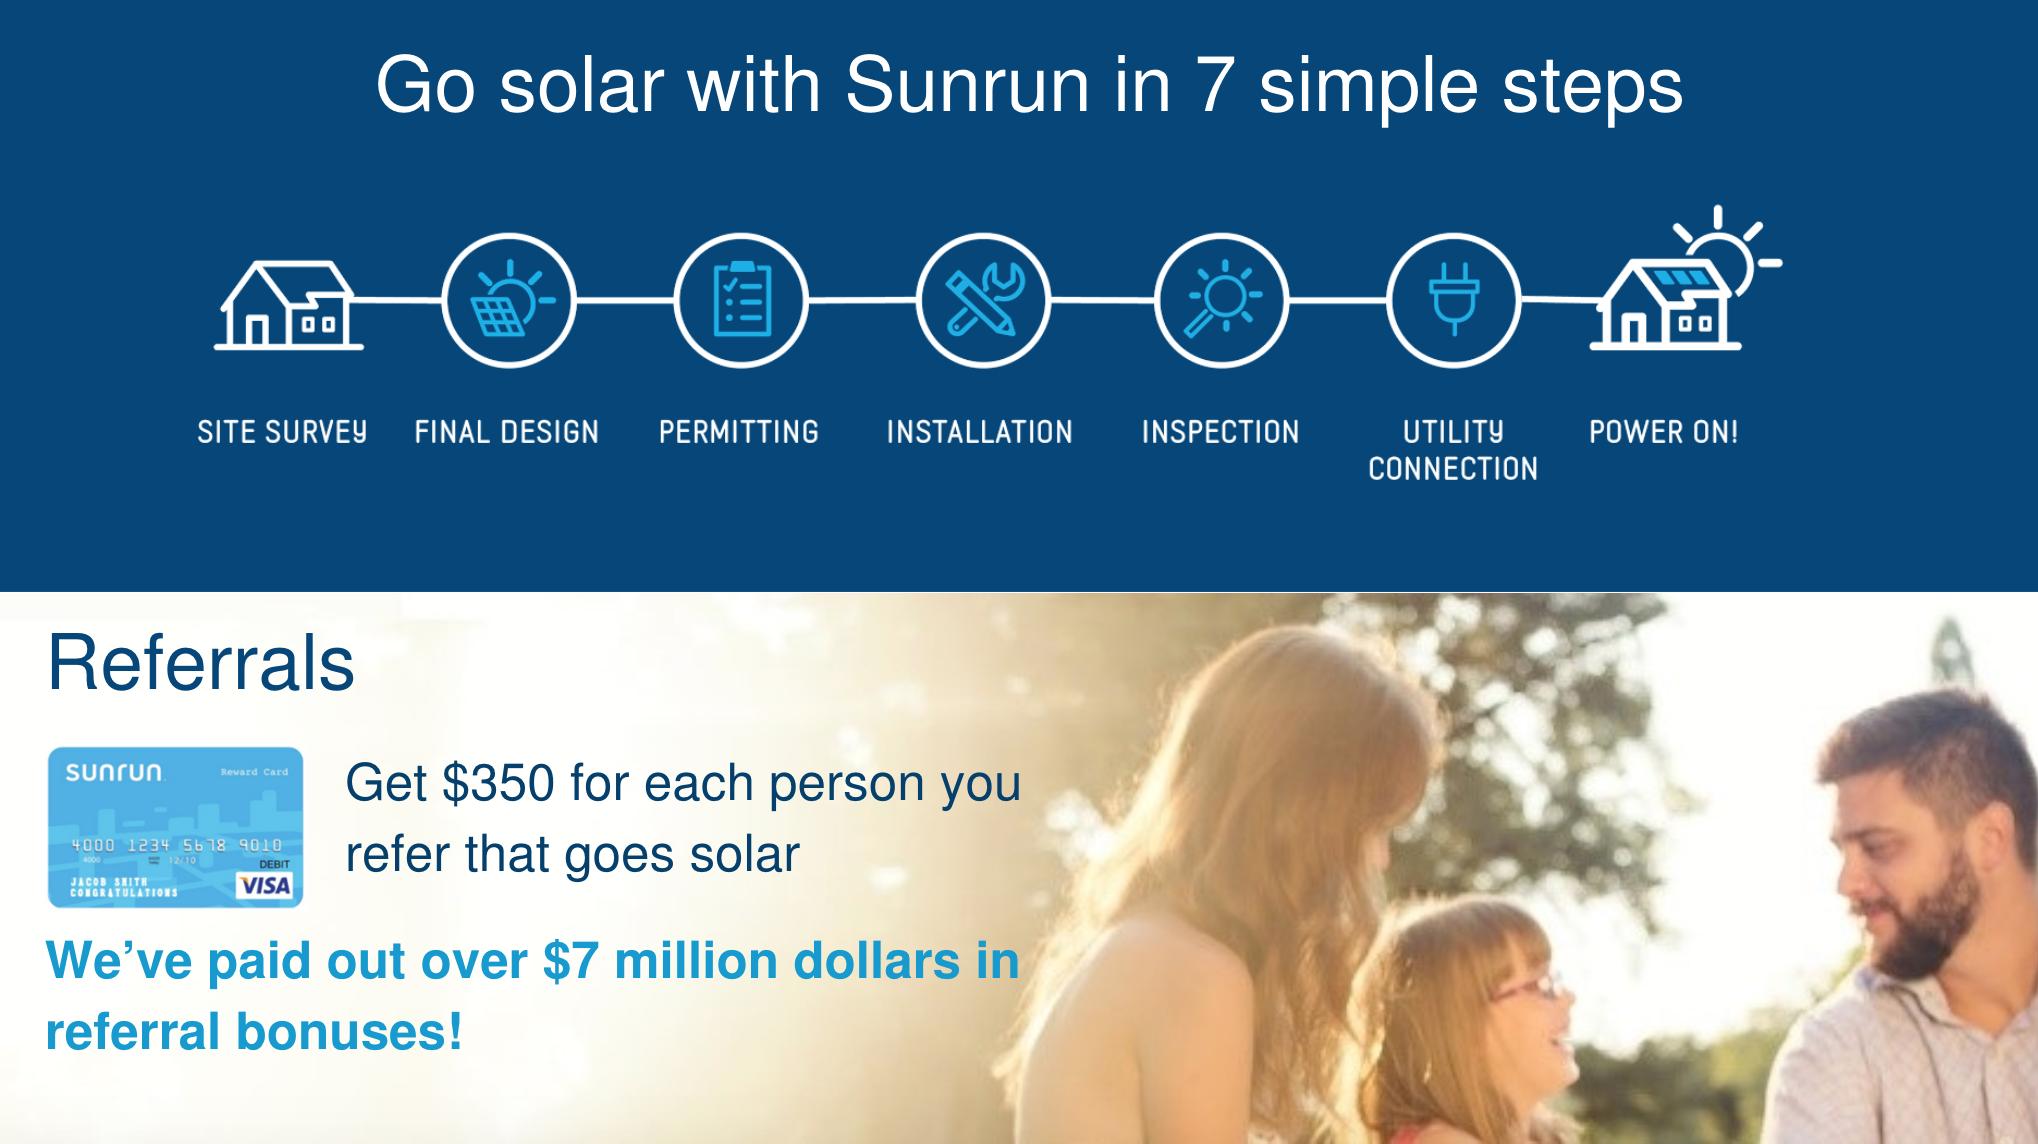 Sunrun in 7 steps